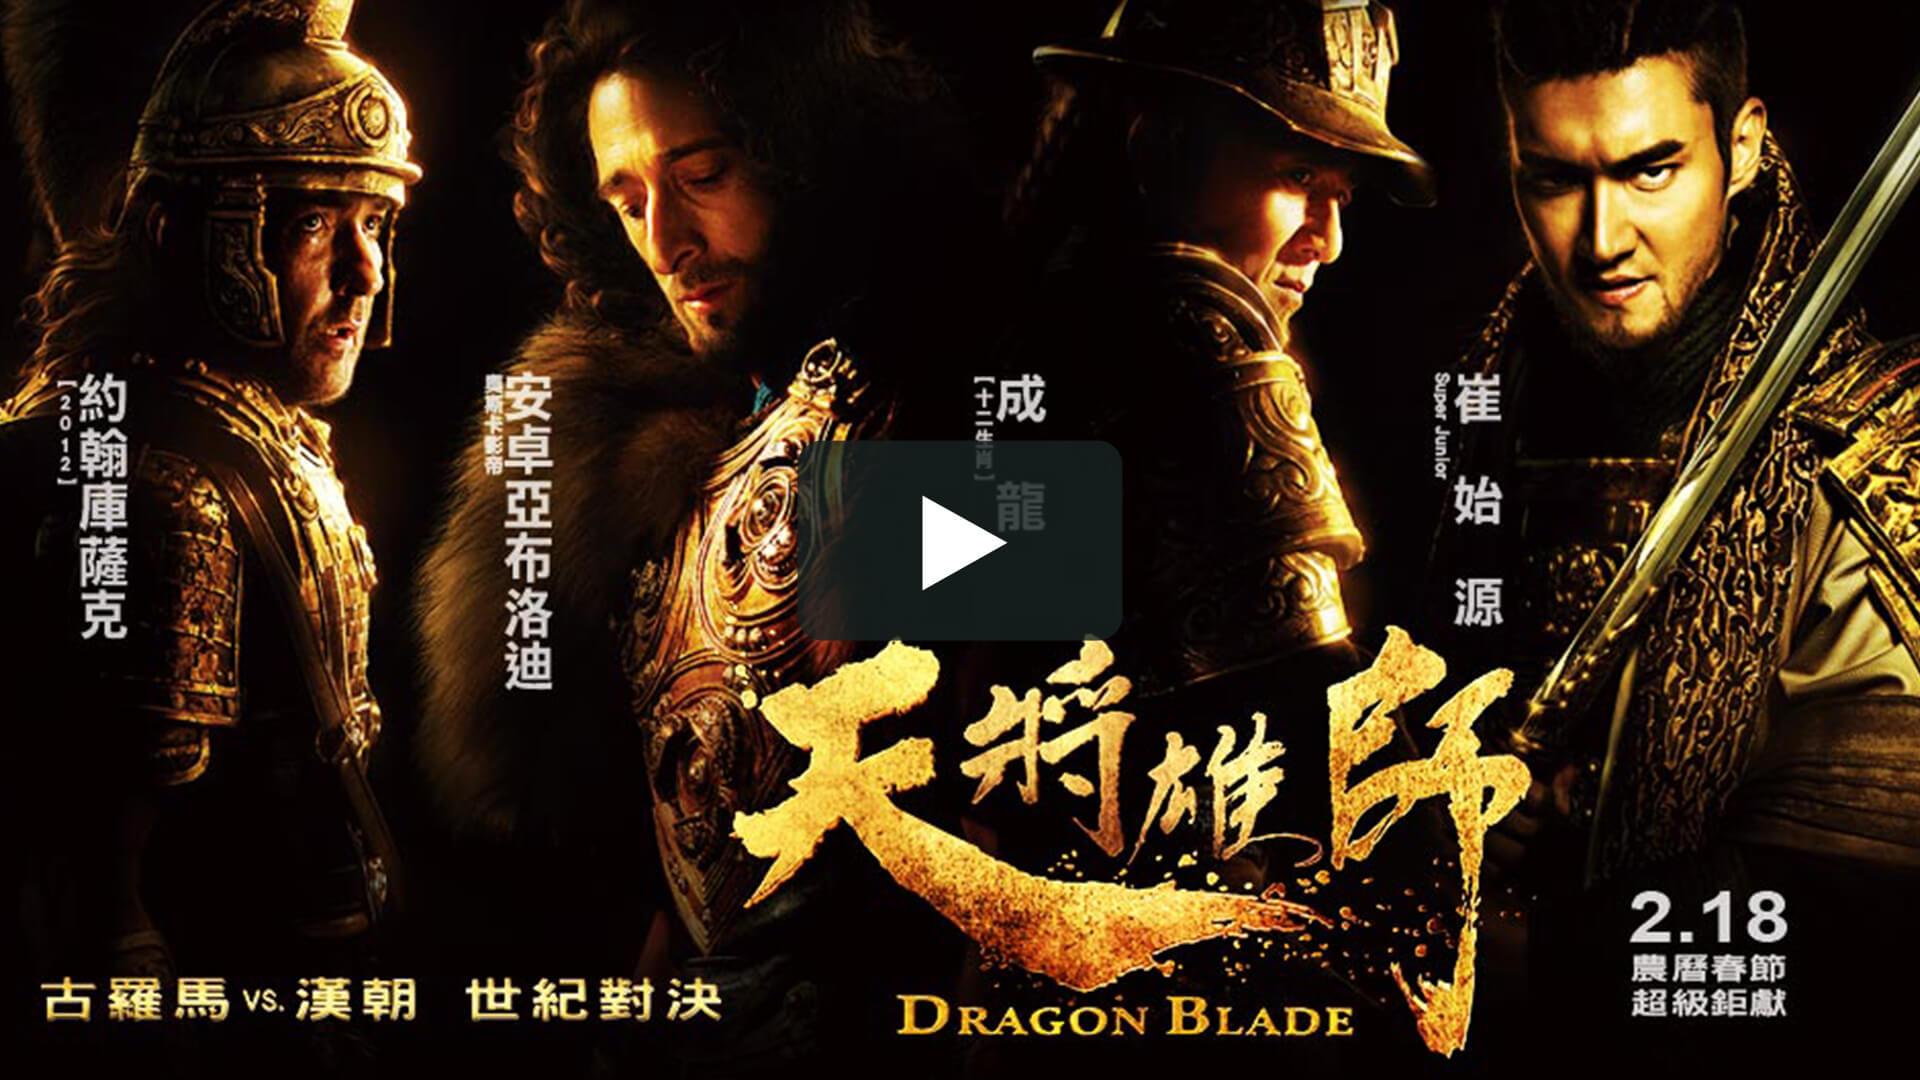 天將雄師 - Dragon Blade